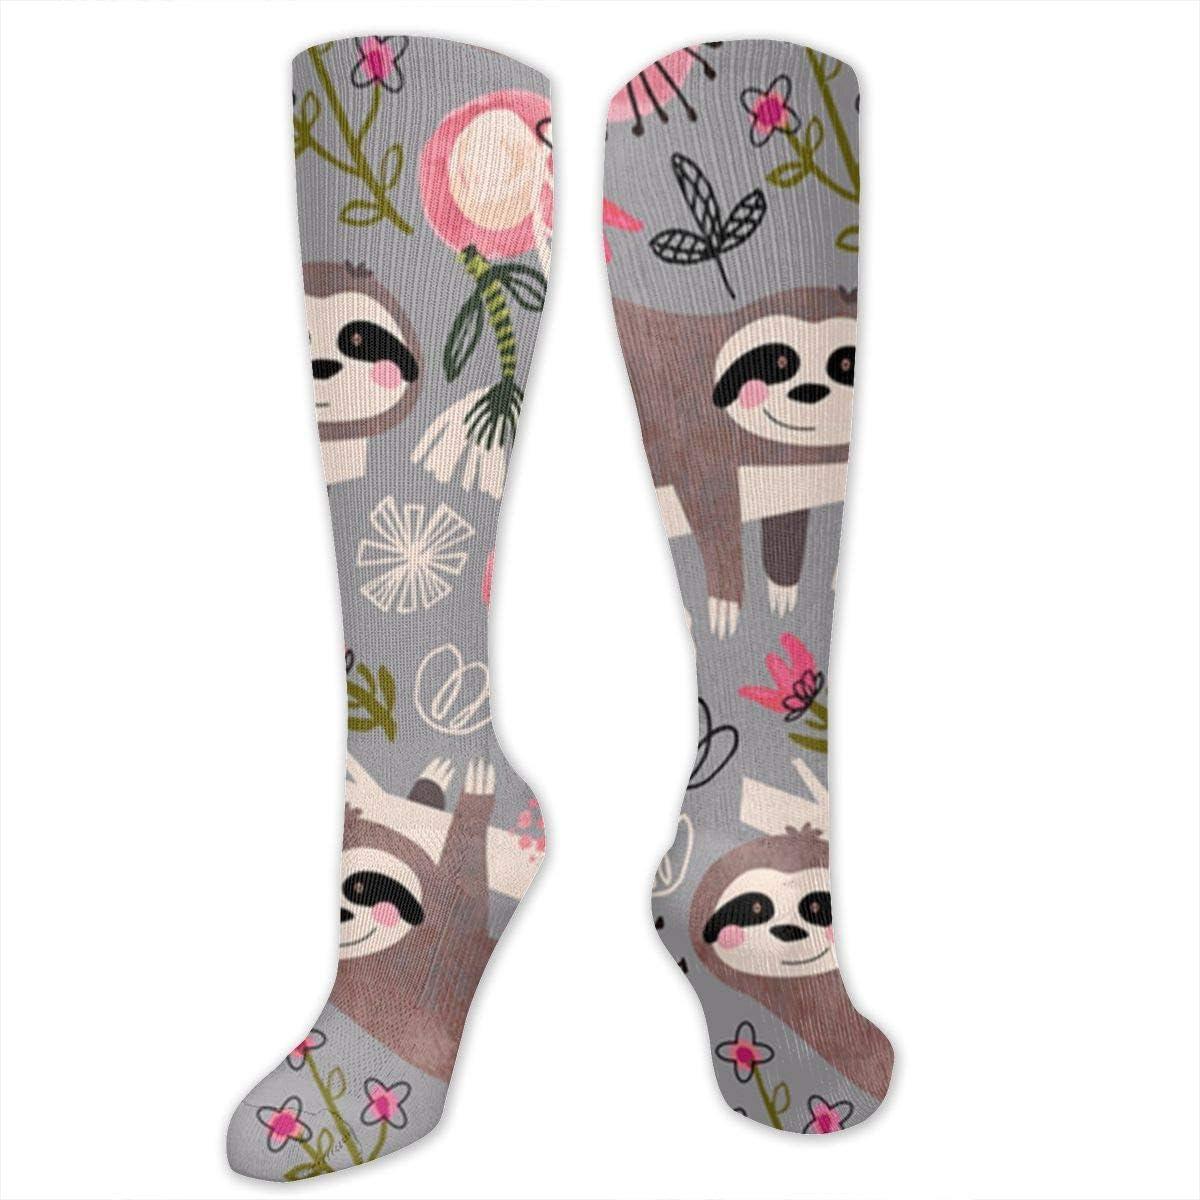 Large Mens Colorful Dress Socks Funky Men Multicolored Pattern Fashionable Fun Crew Cotton Socks Chanwazibibiliu Lovable Sloths